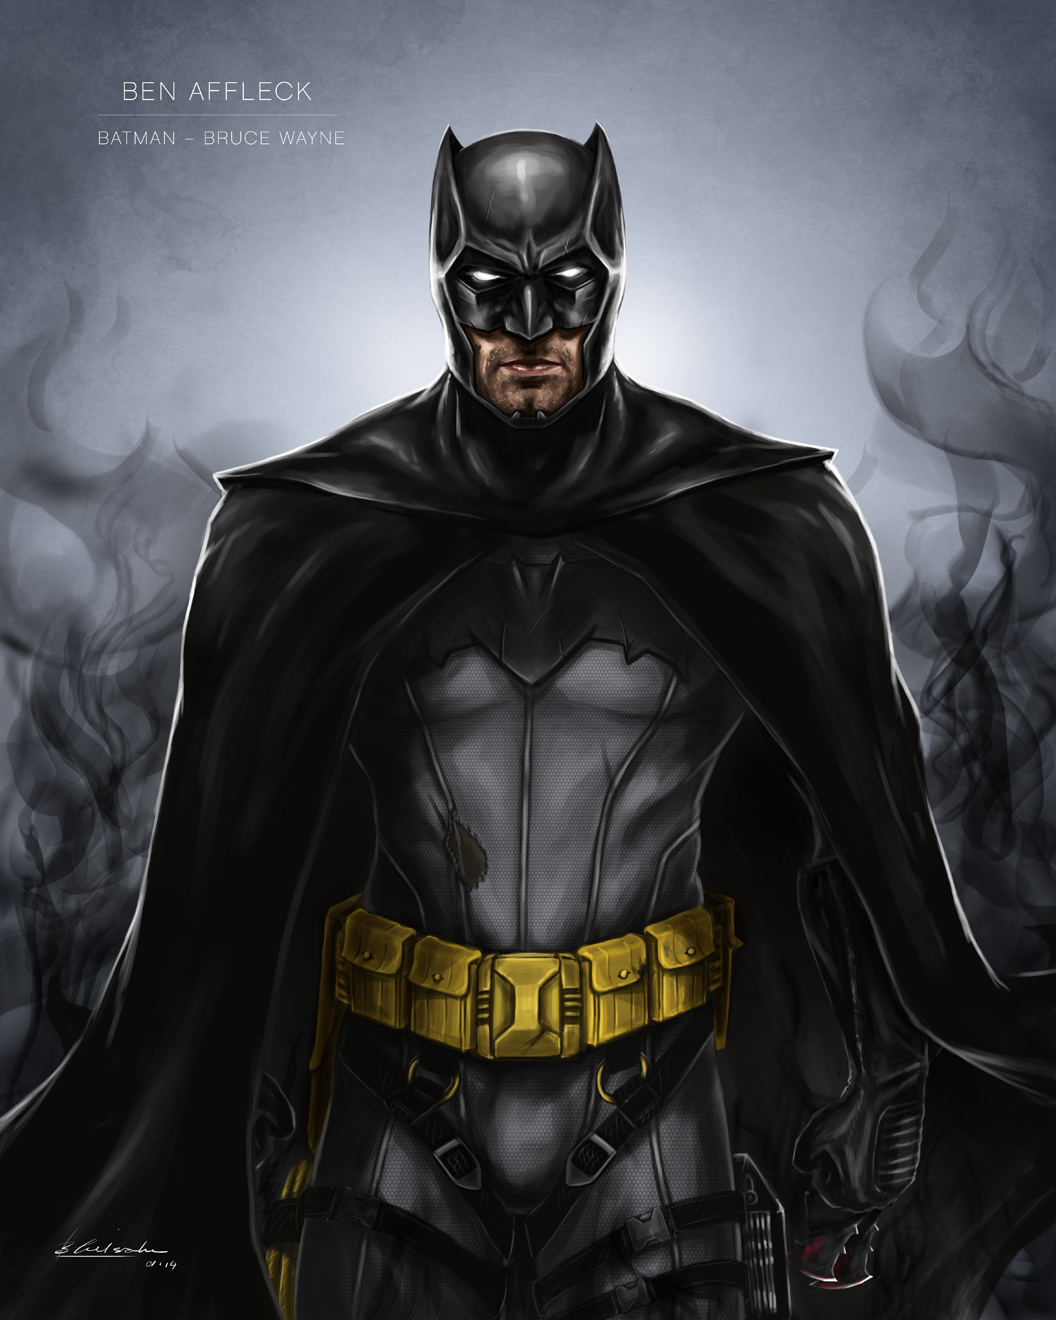 Seth Green on Why Ben Affleck Is Not a Good Batman Choice ...